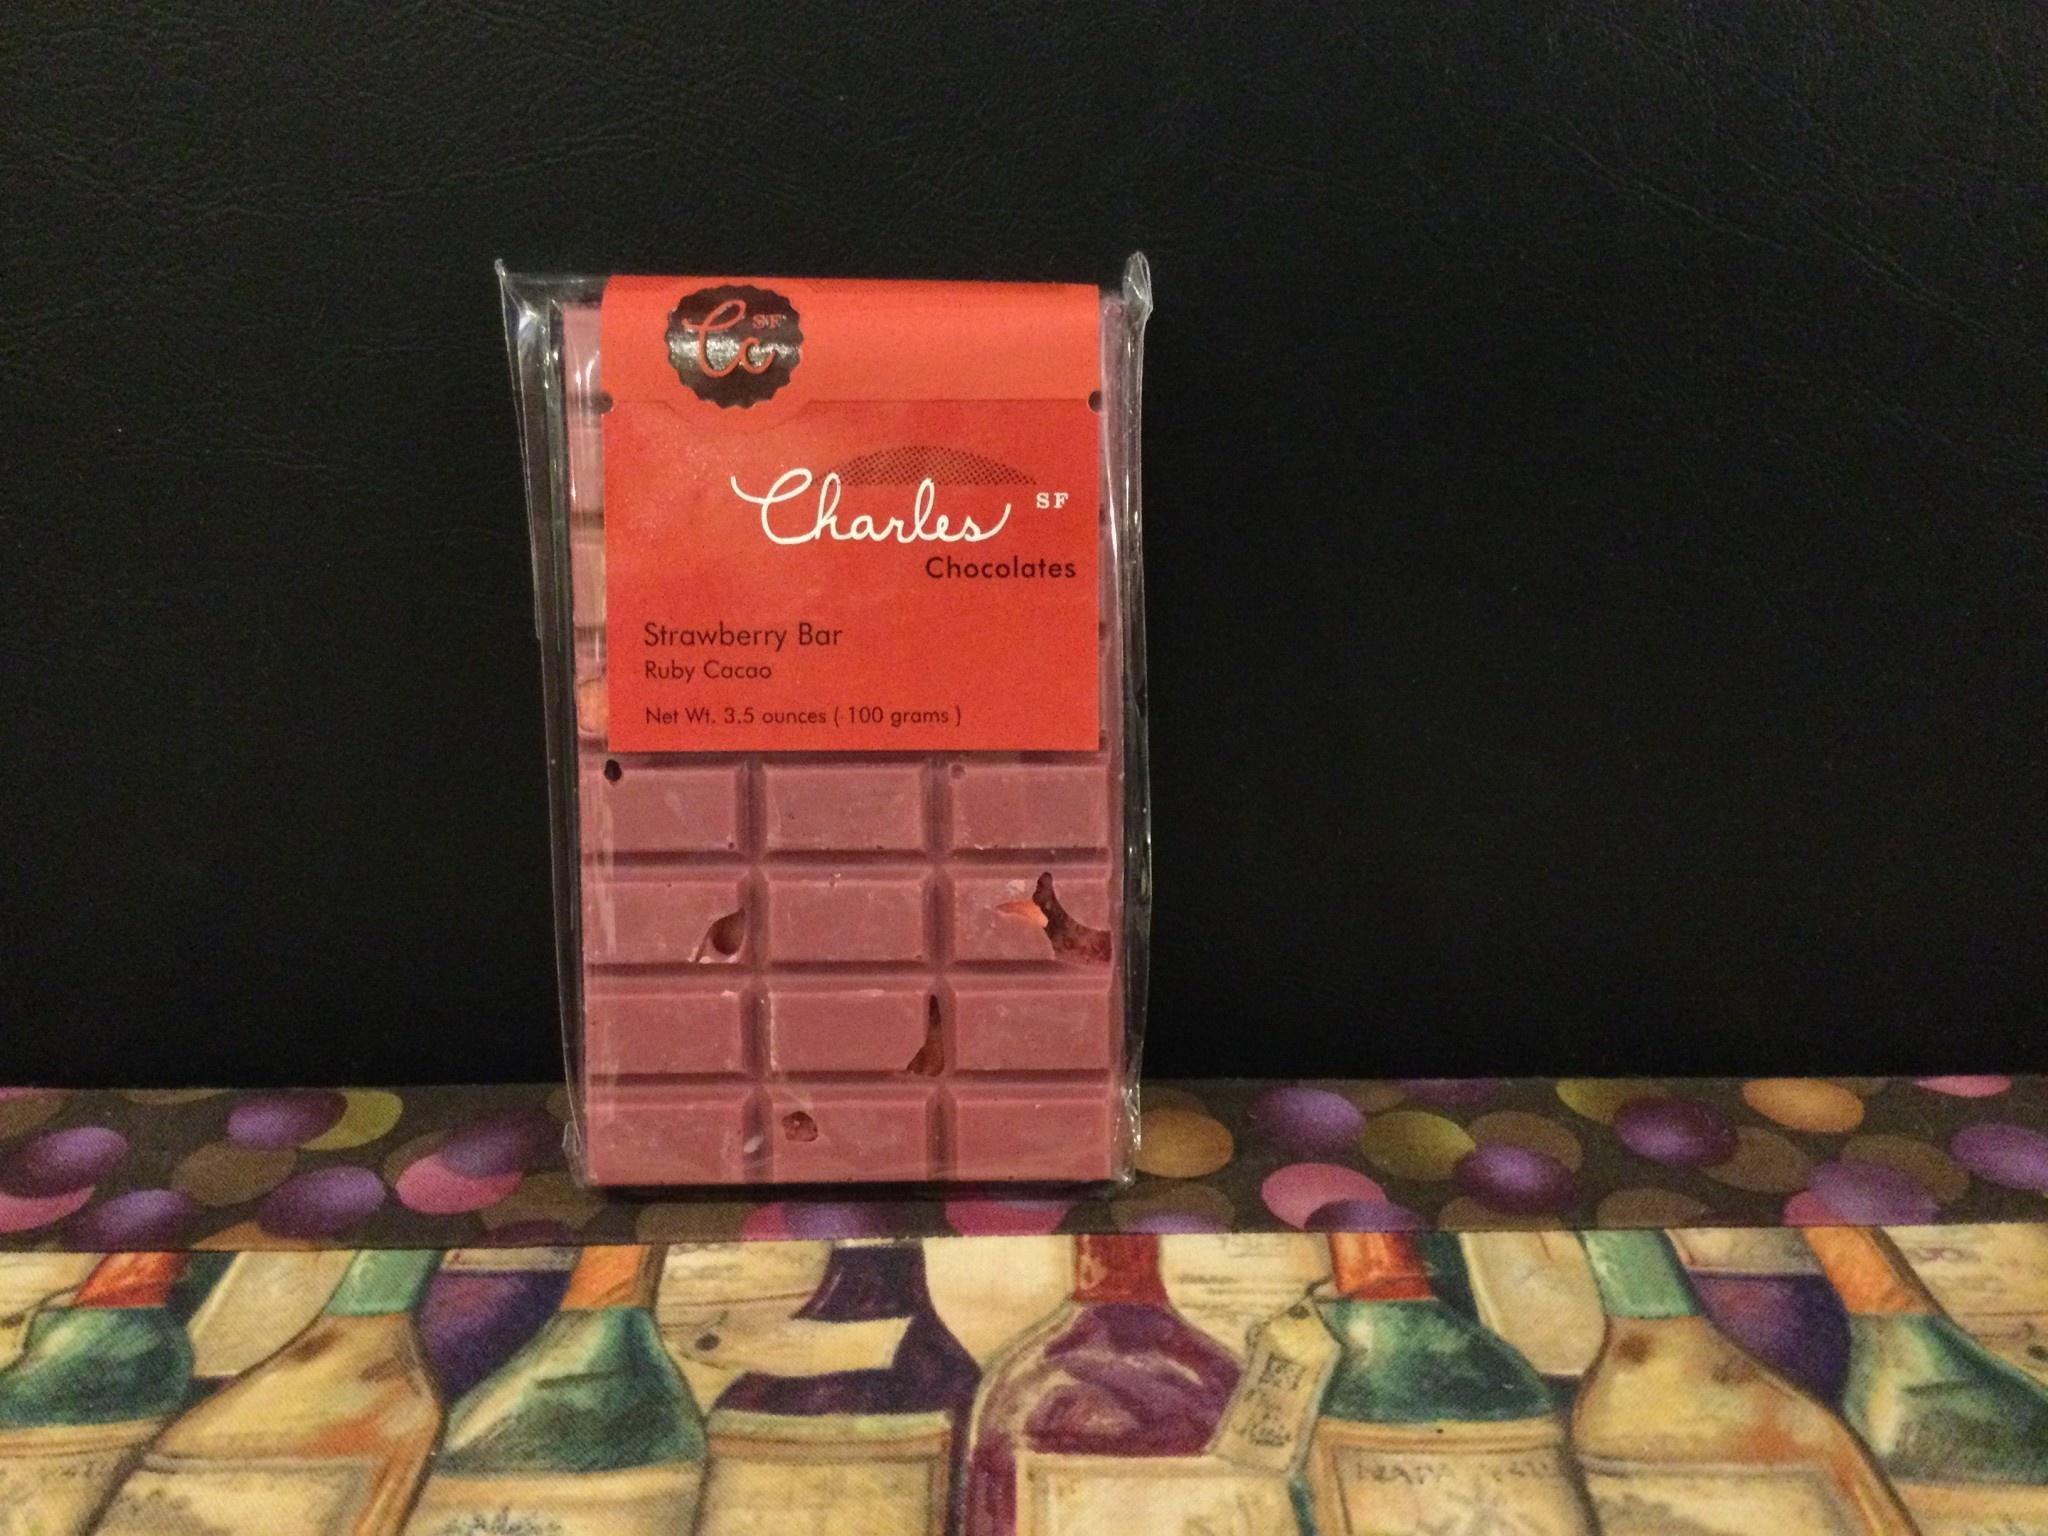 Charles Chocolate Ruby Strawberry bars